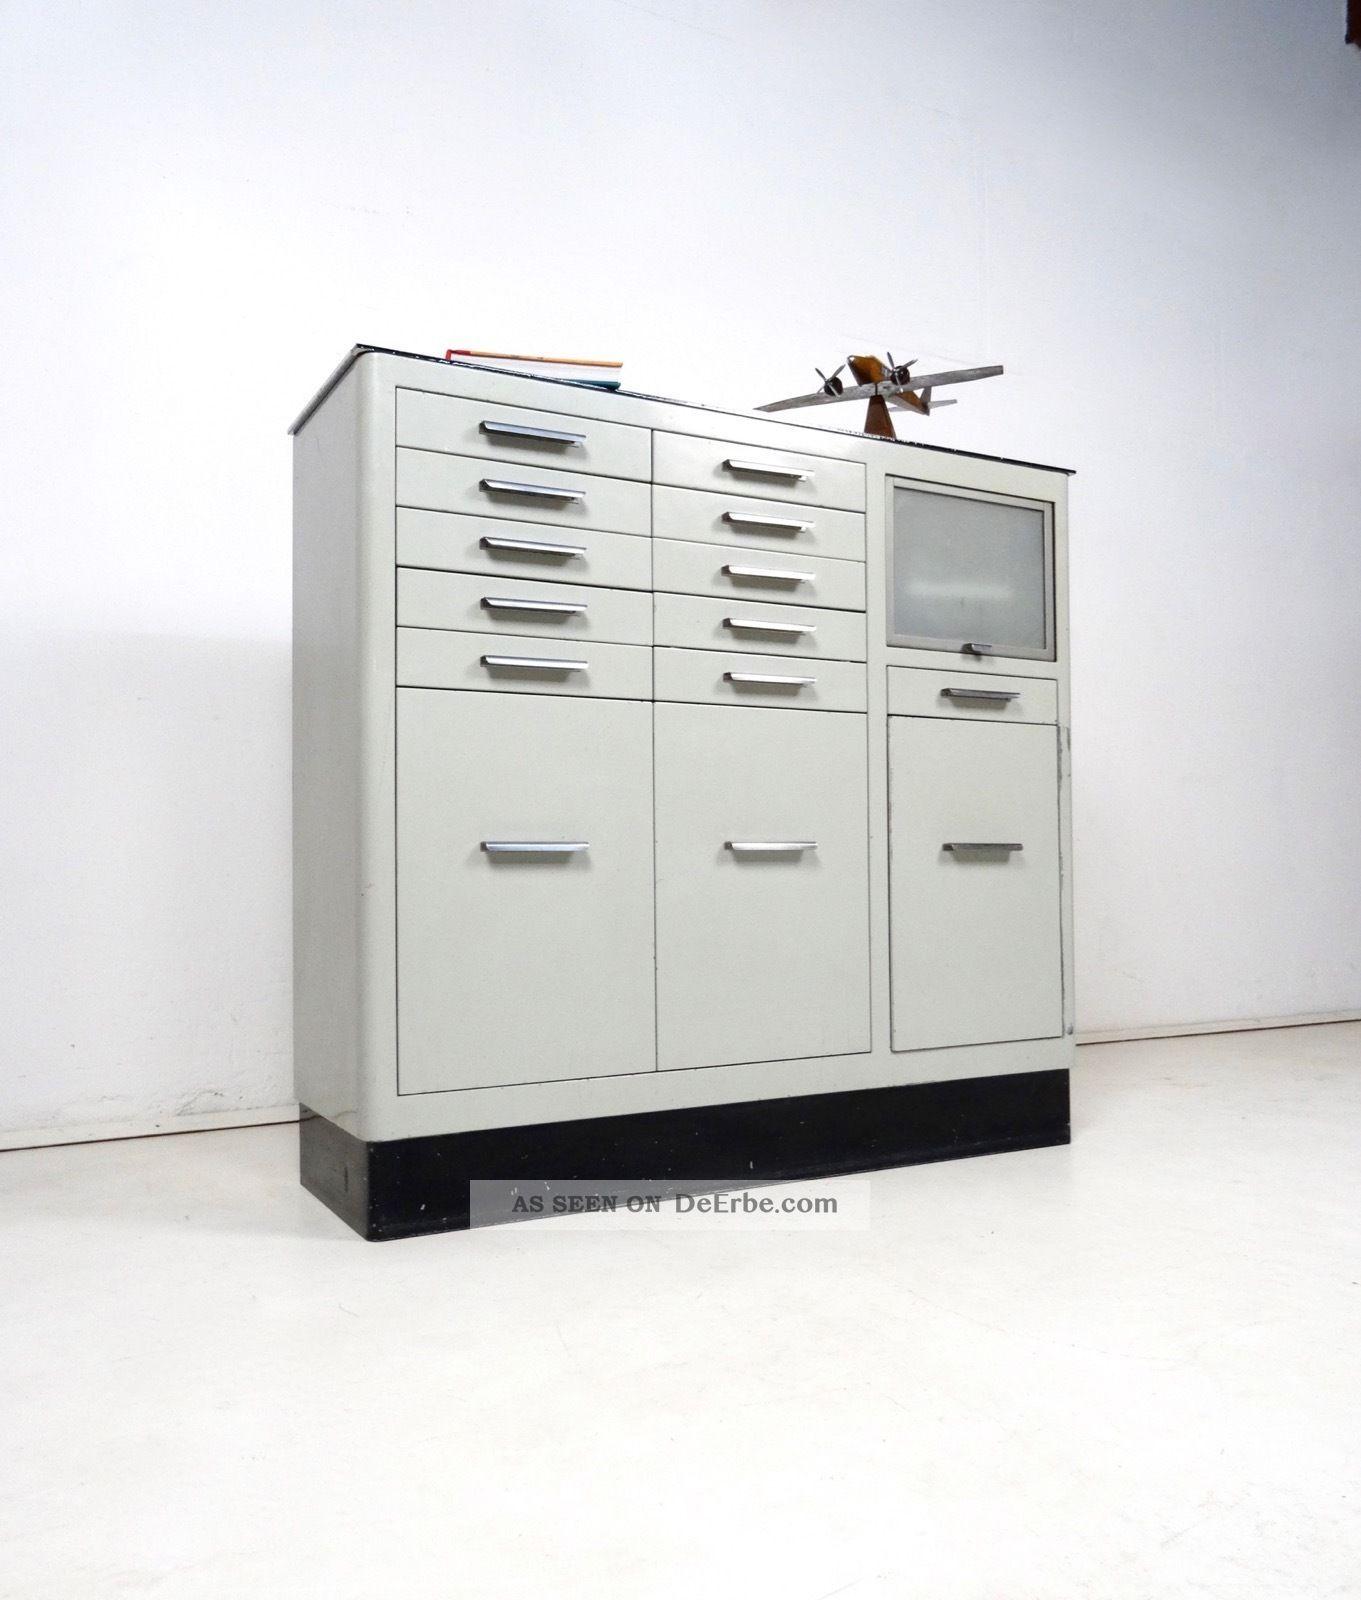 Metall Arztschrank 30er Sideboard Loft Bauhaus Arzt MÖbel Steampunk 1920-1949, Art Déco Bild